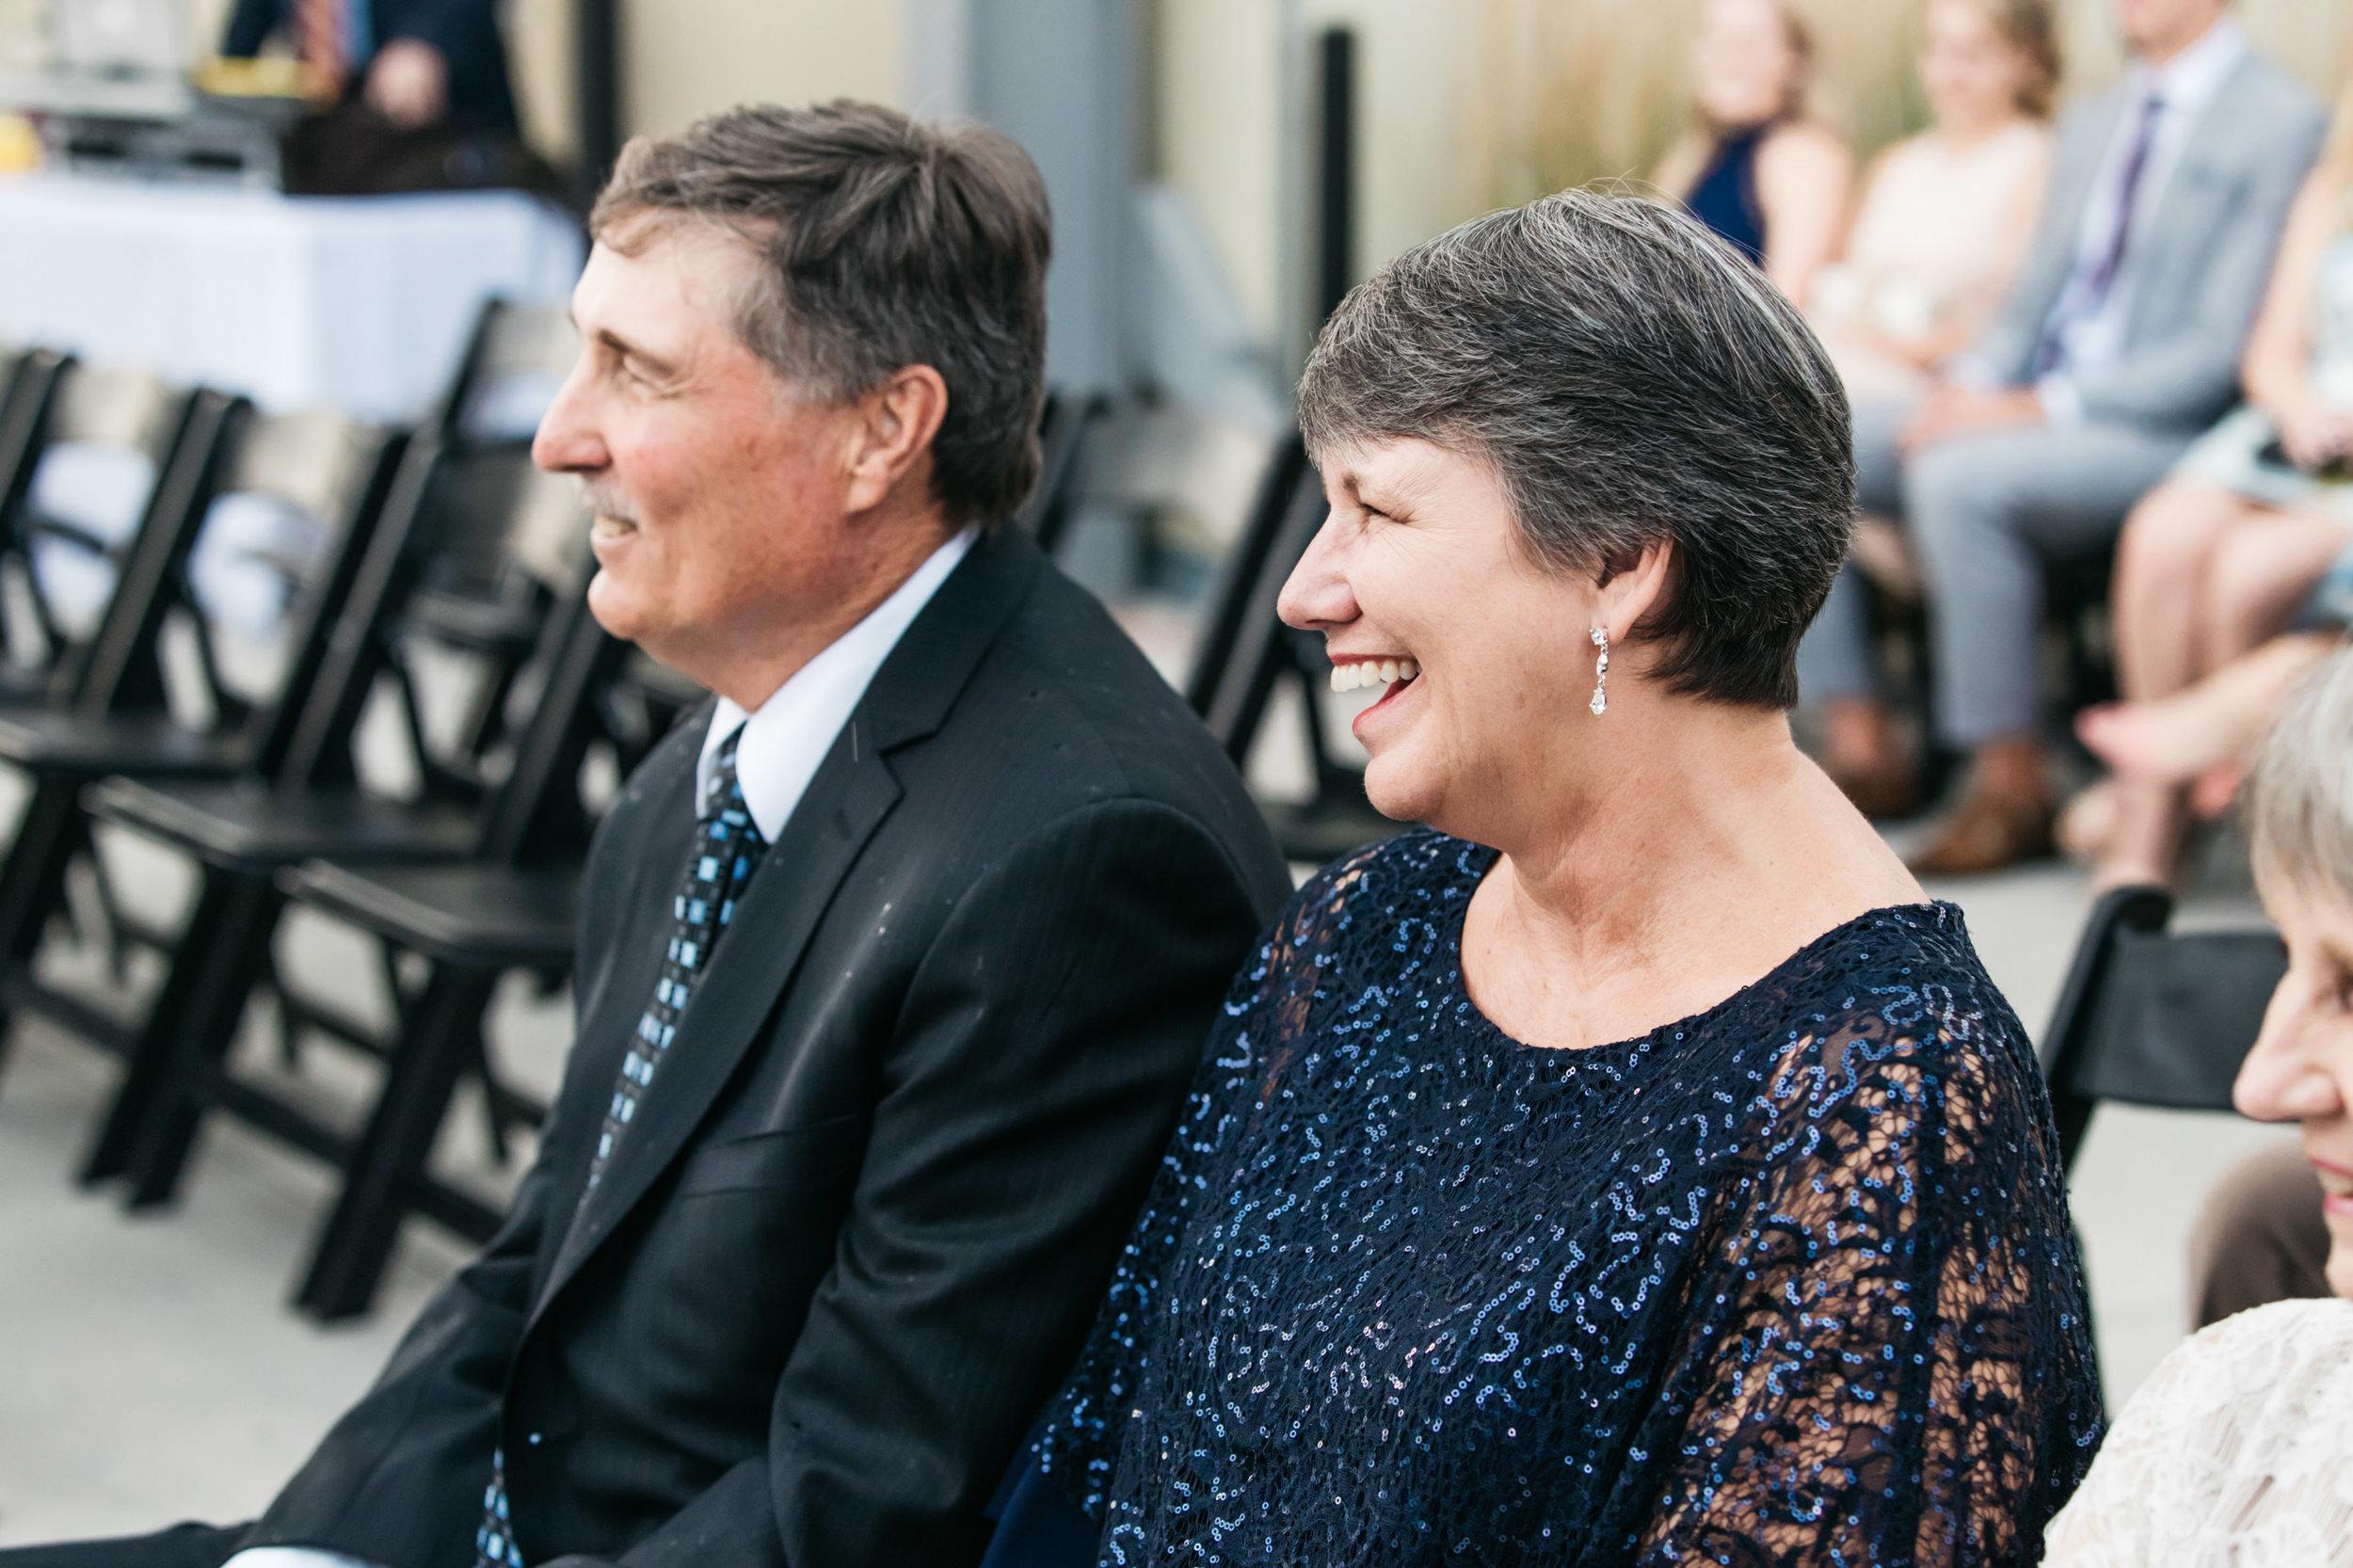 Parents during vows